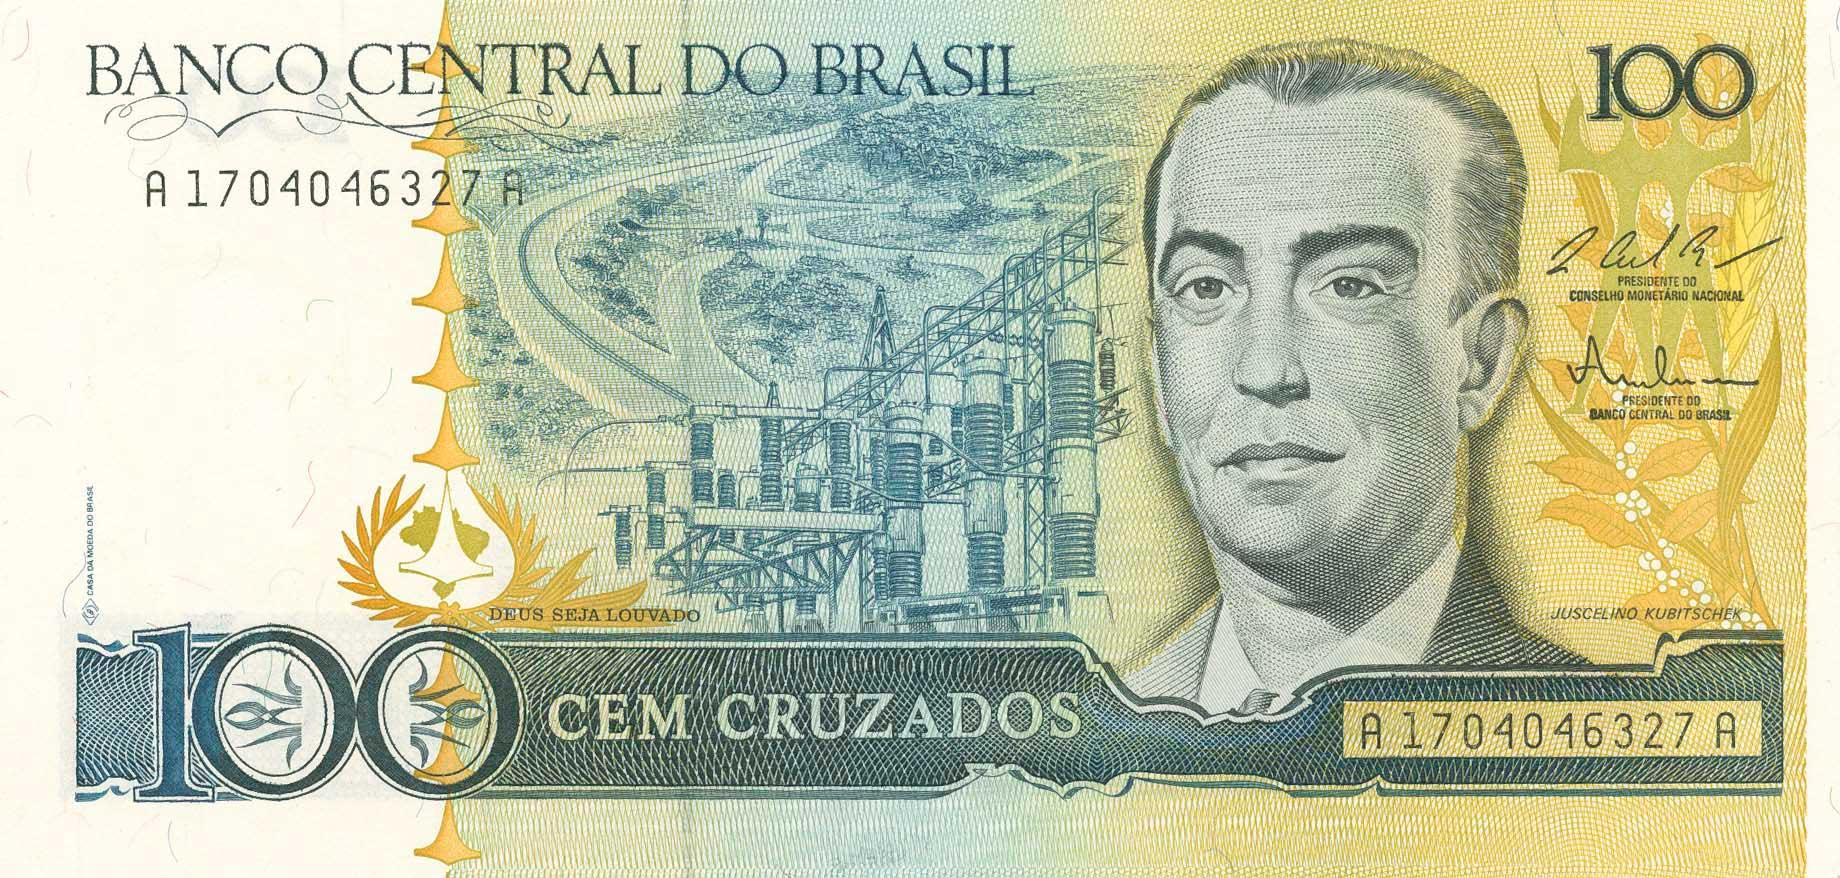 BRA-0211c-a